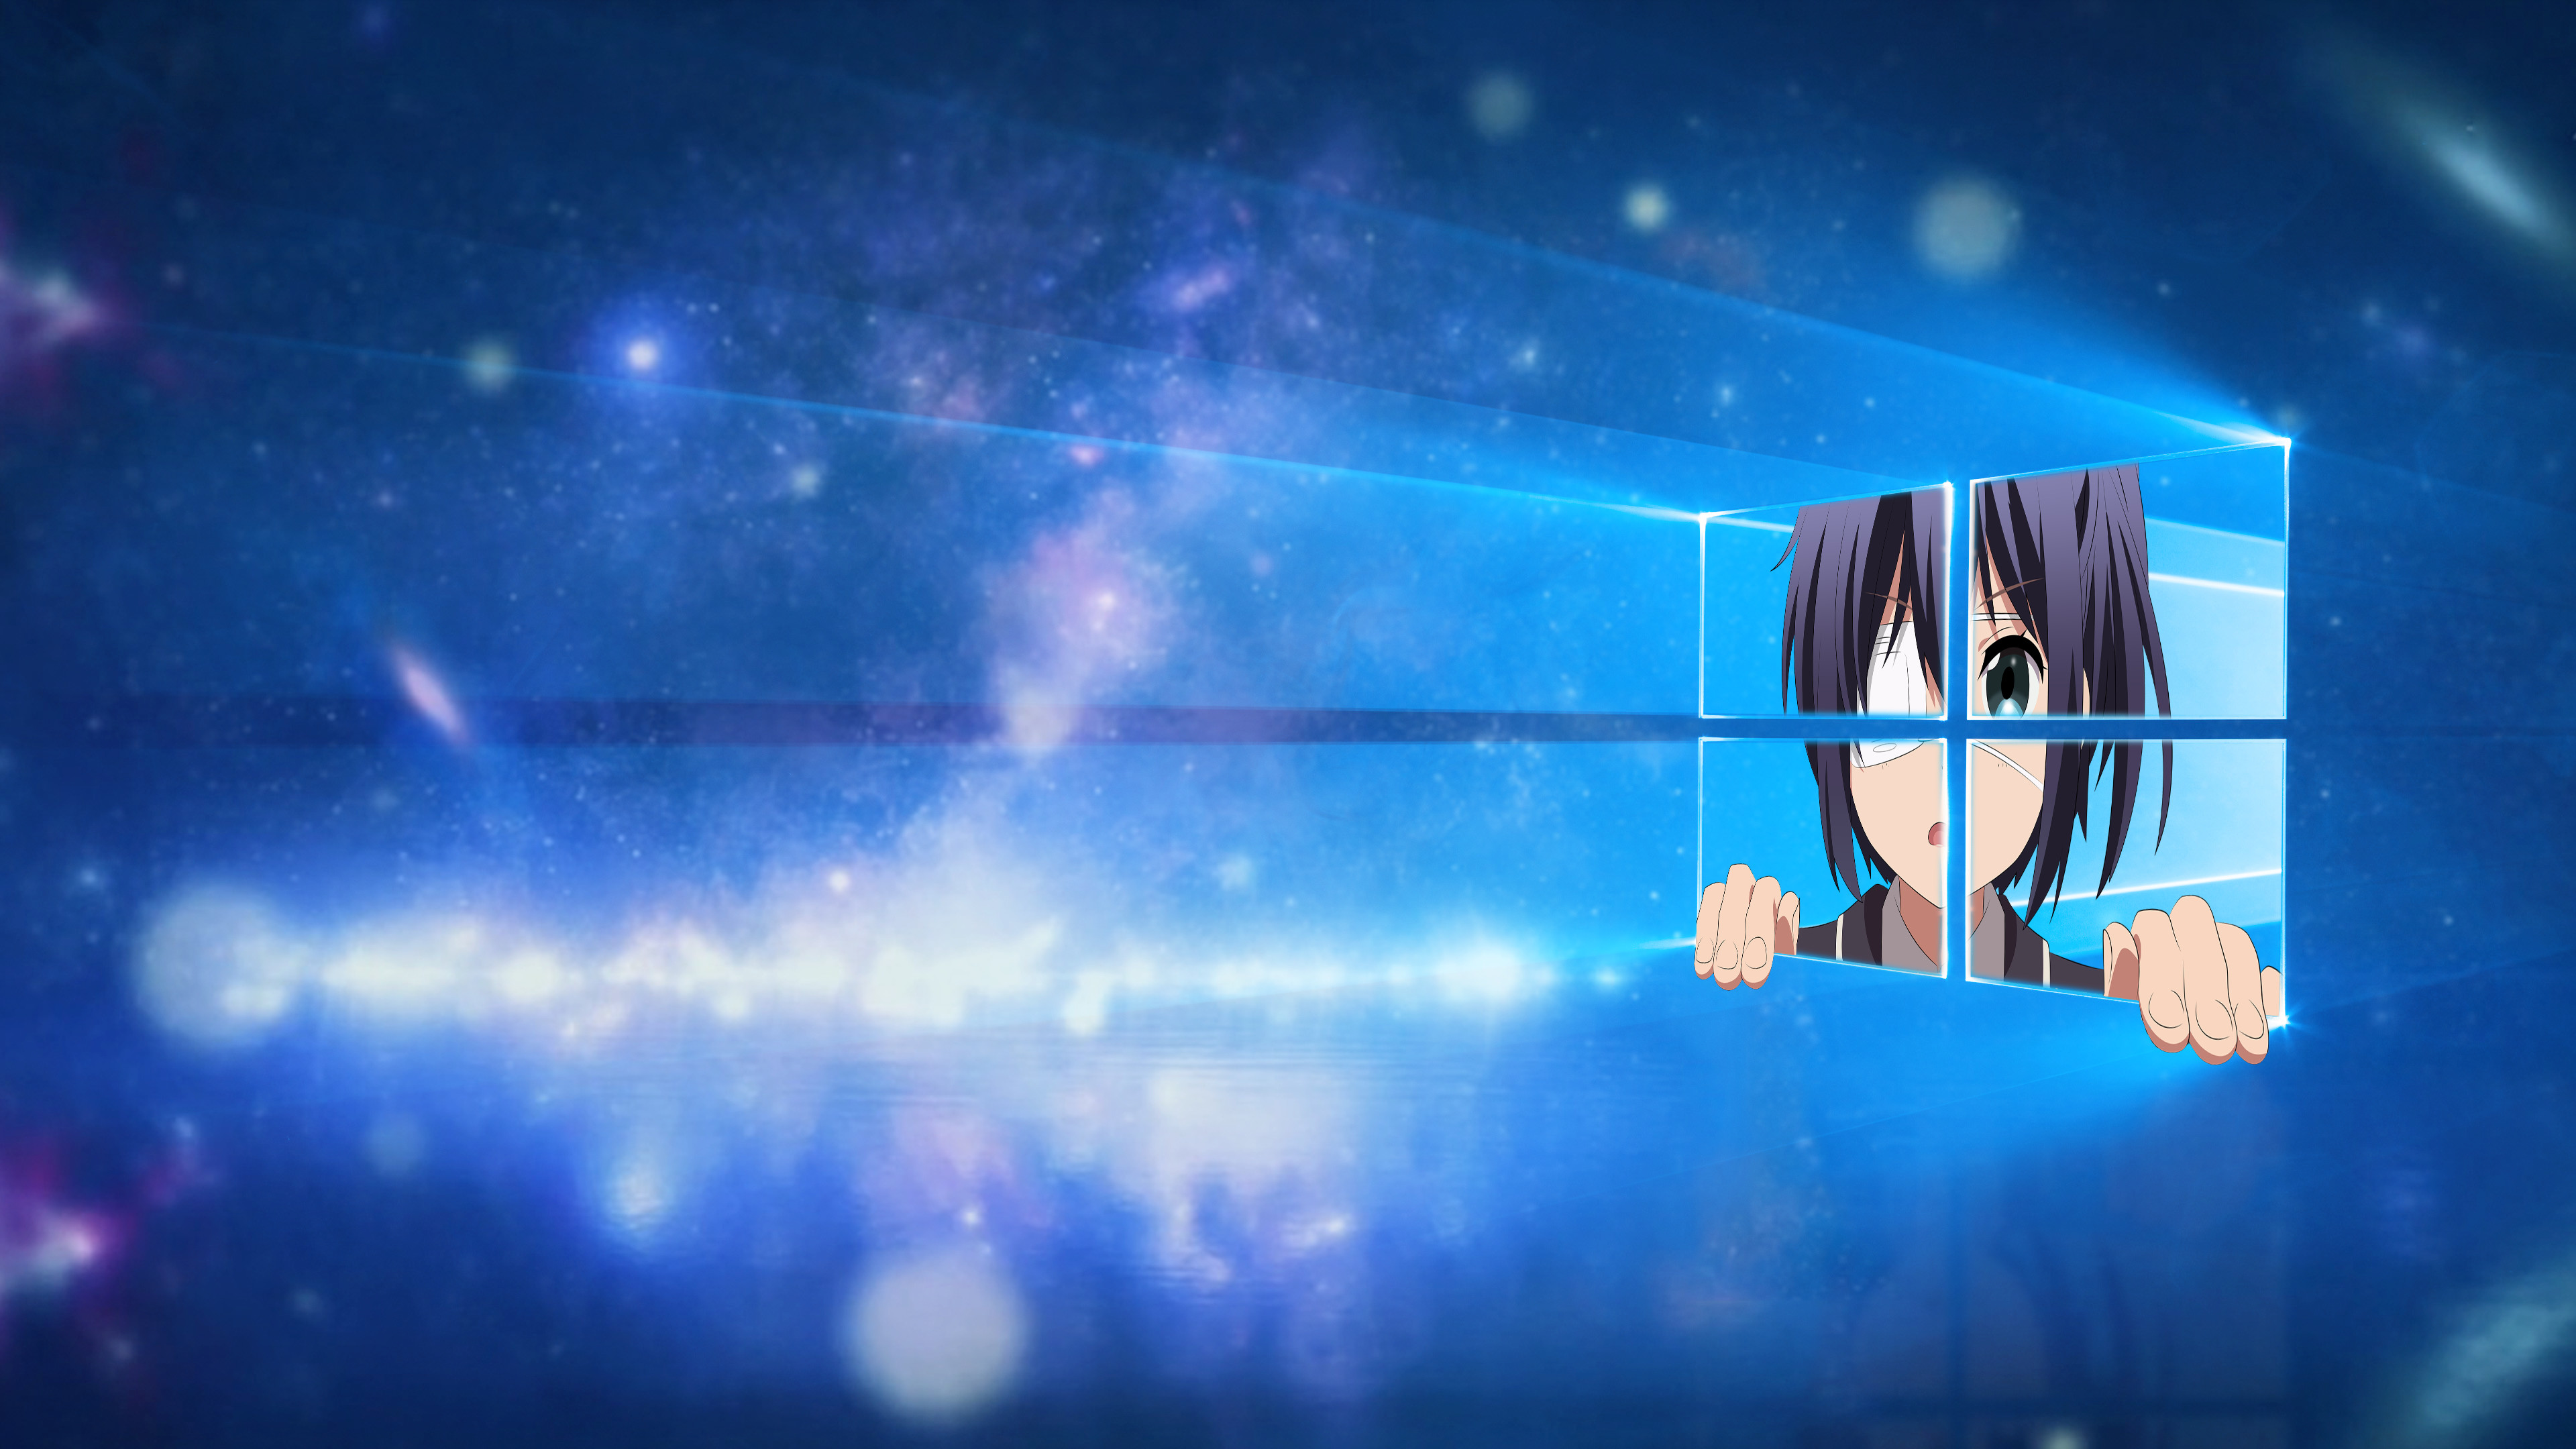 Windows 10 Girl Wallpaper 75 Images